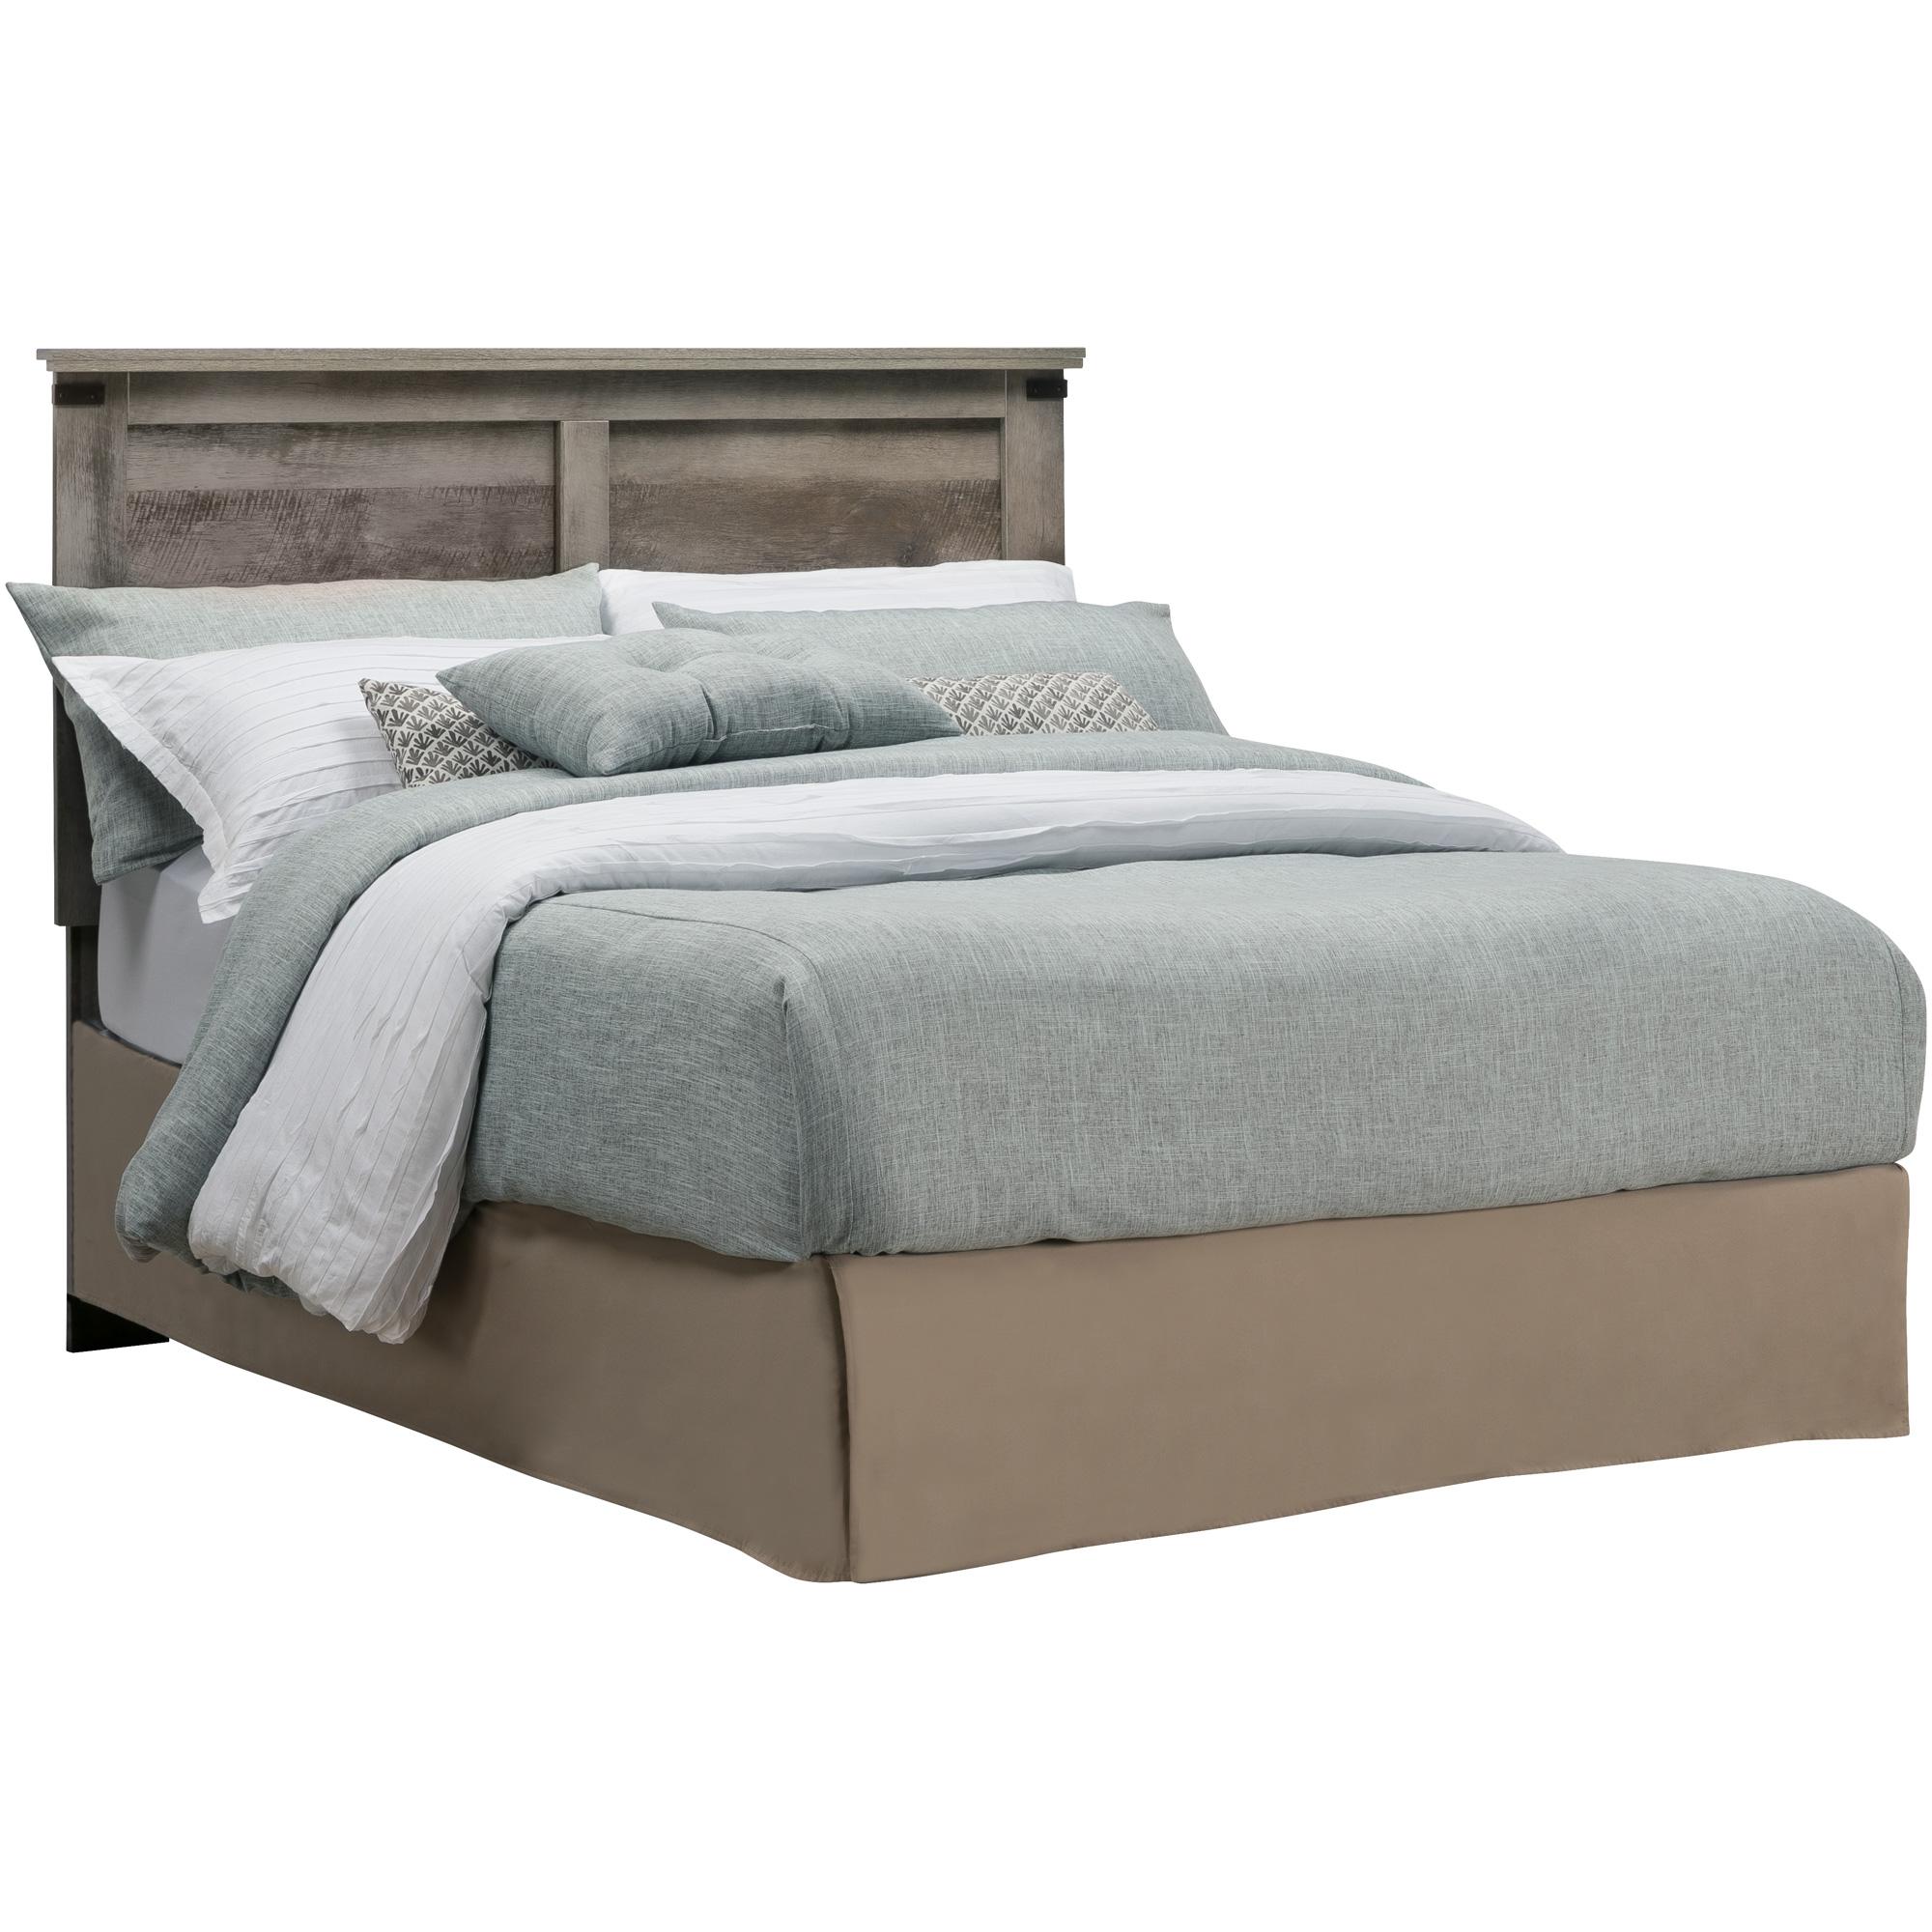 Kith Furniture | Gambrel Driftwood Full Queen Panel Headboard